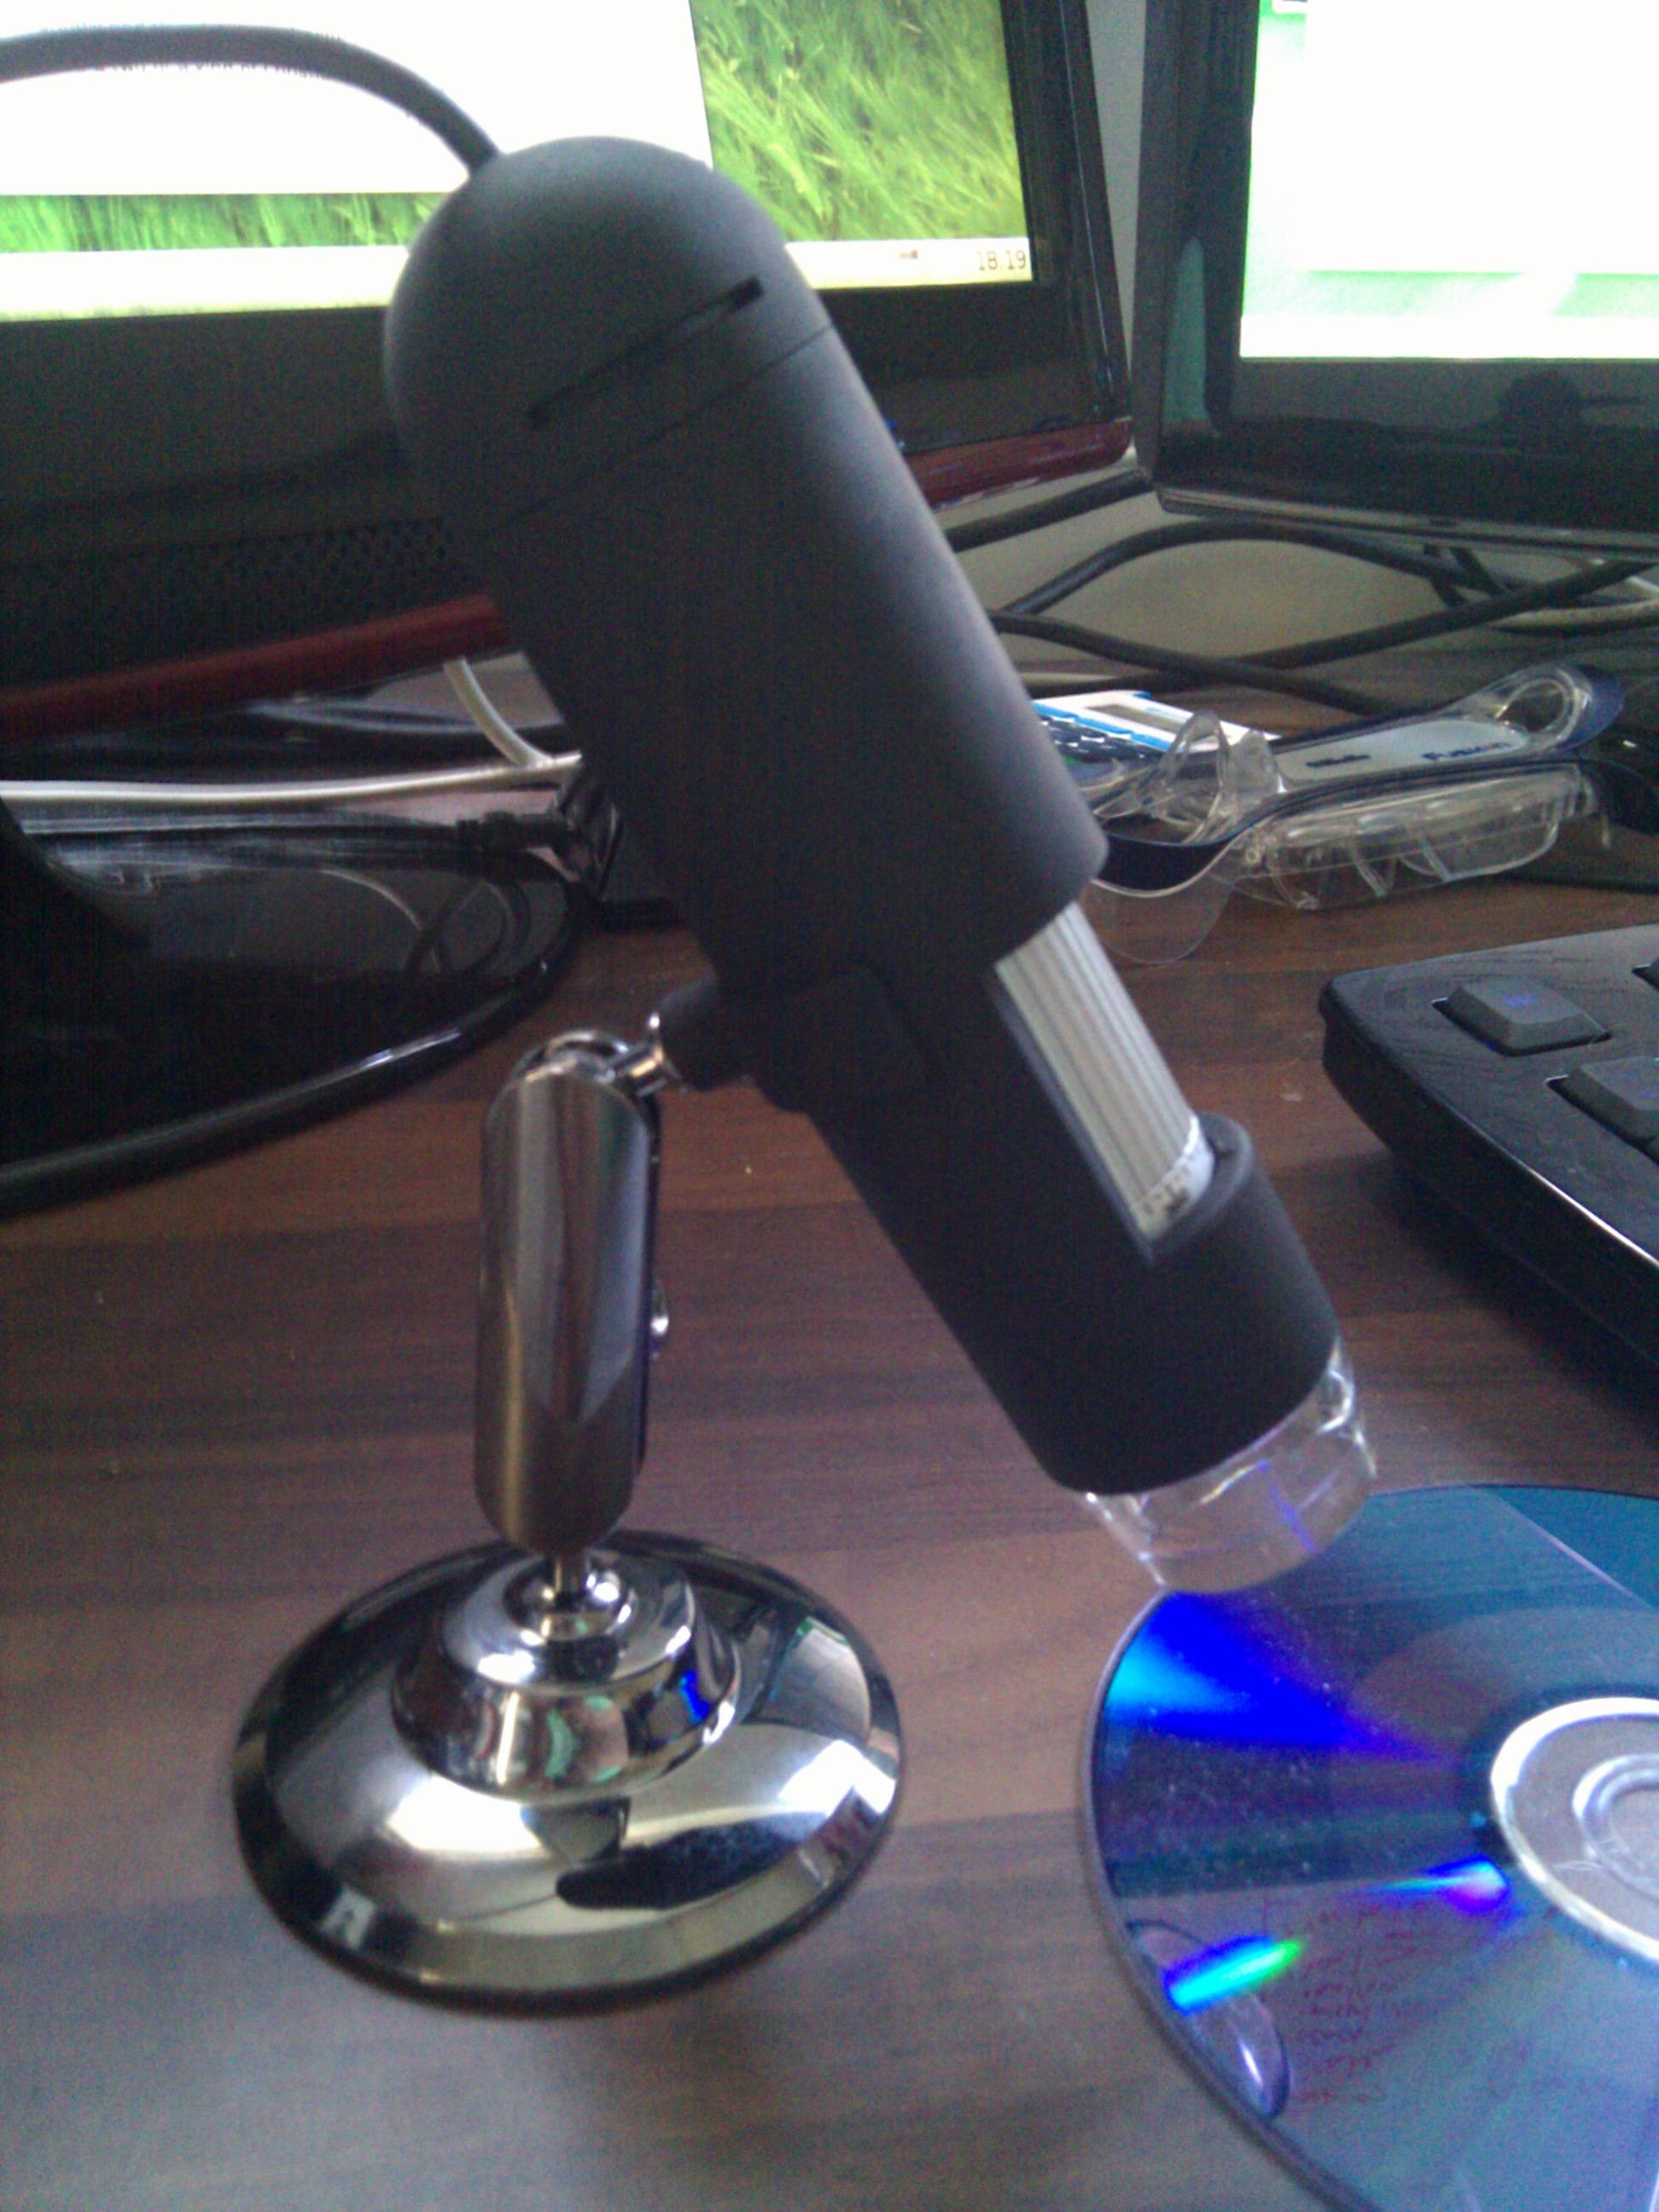 20X-400X 1.3MP Digital Microscope